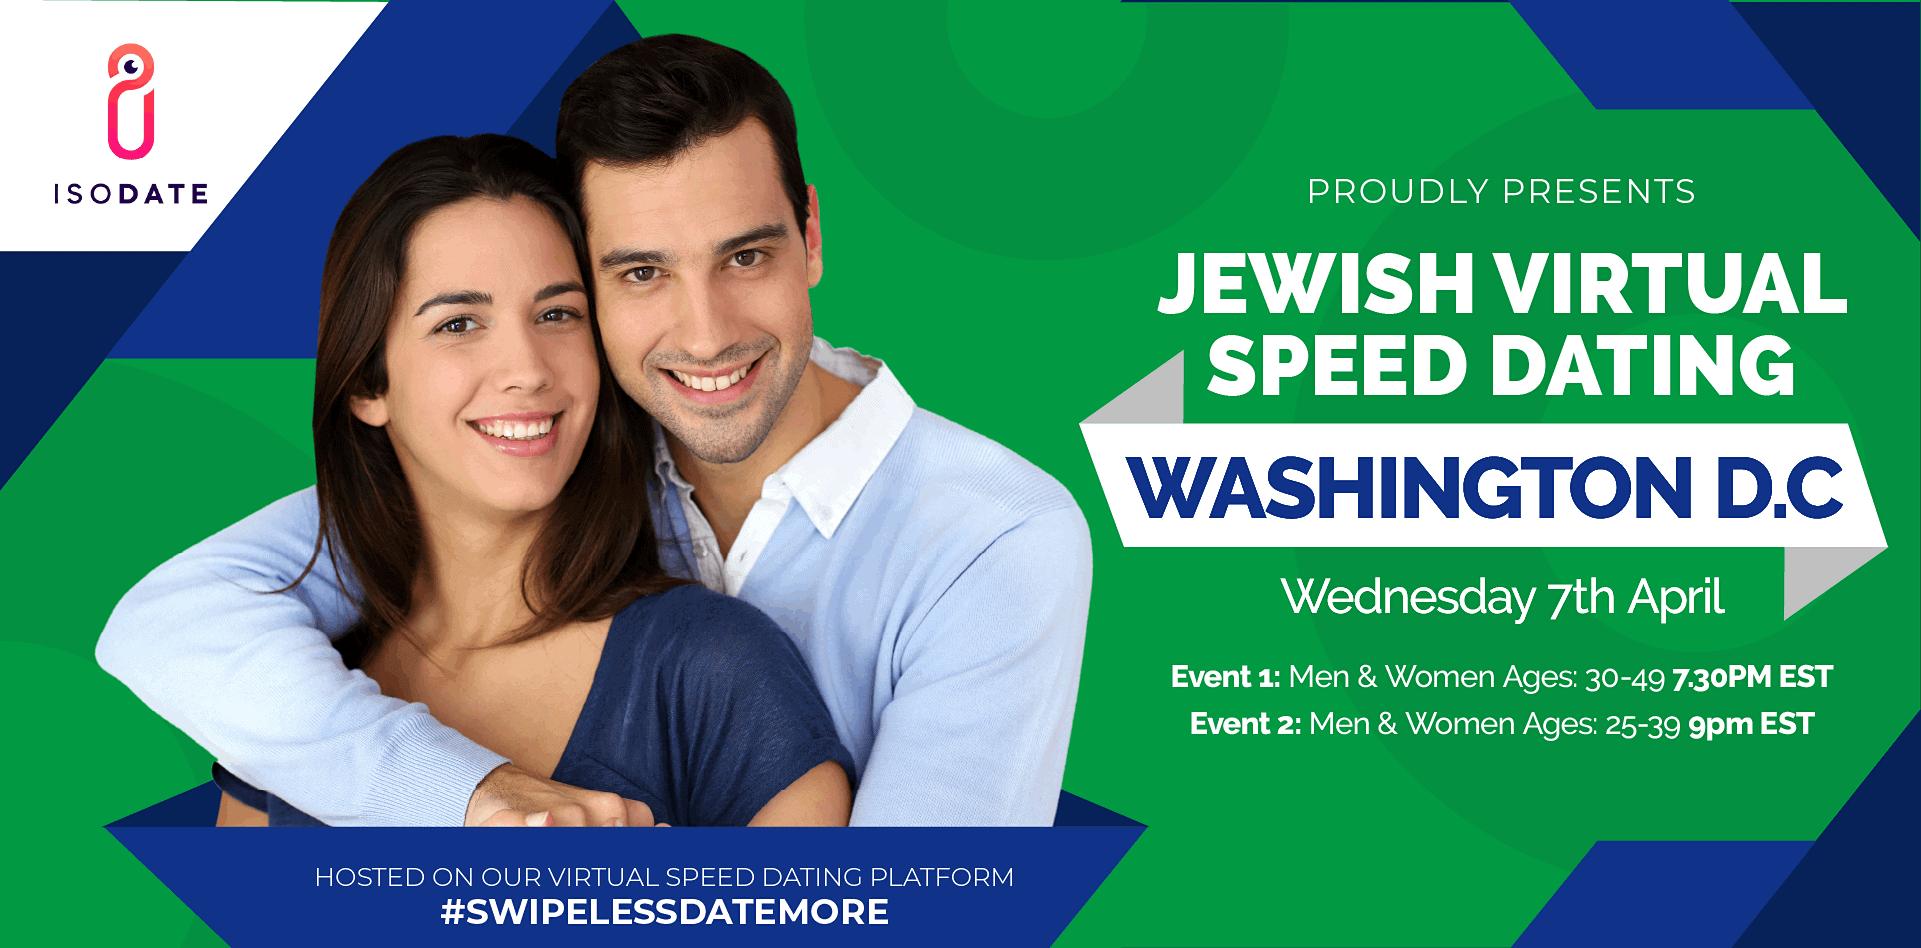 Isodate's Washington DC Jewish Virtual Speed Dating - Swipe Less, Date More